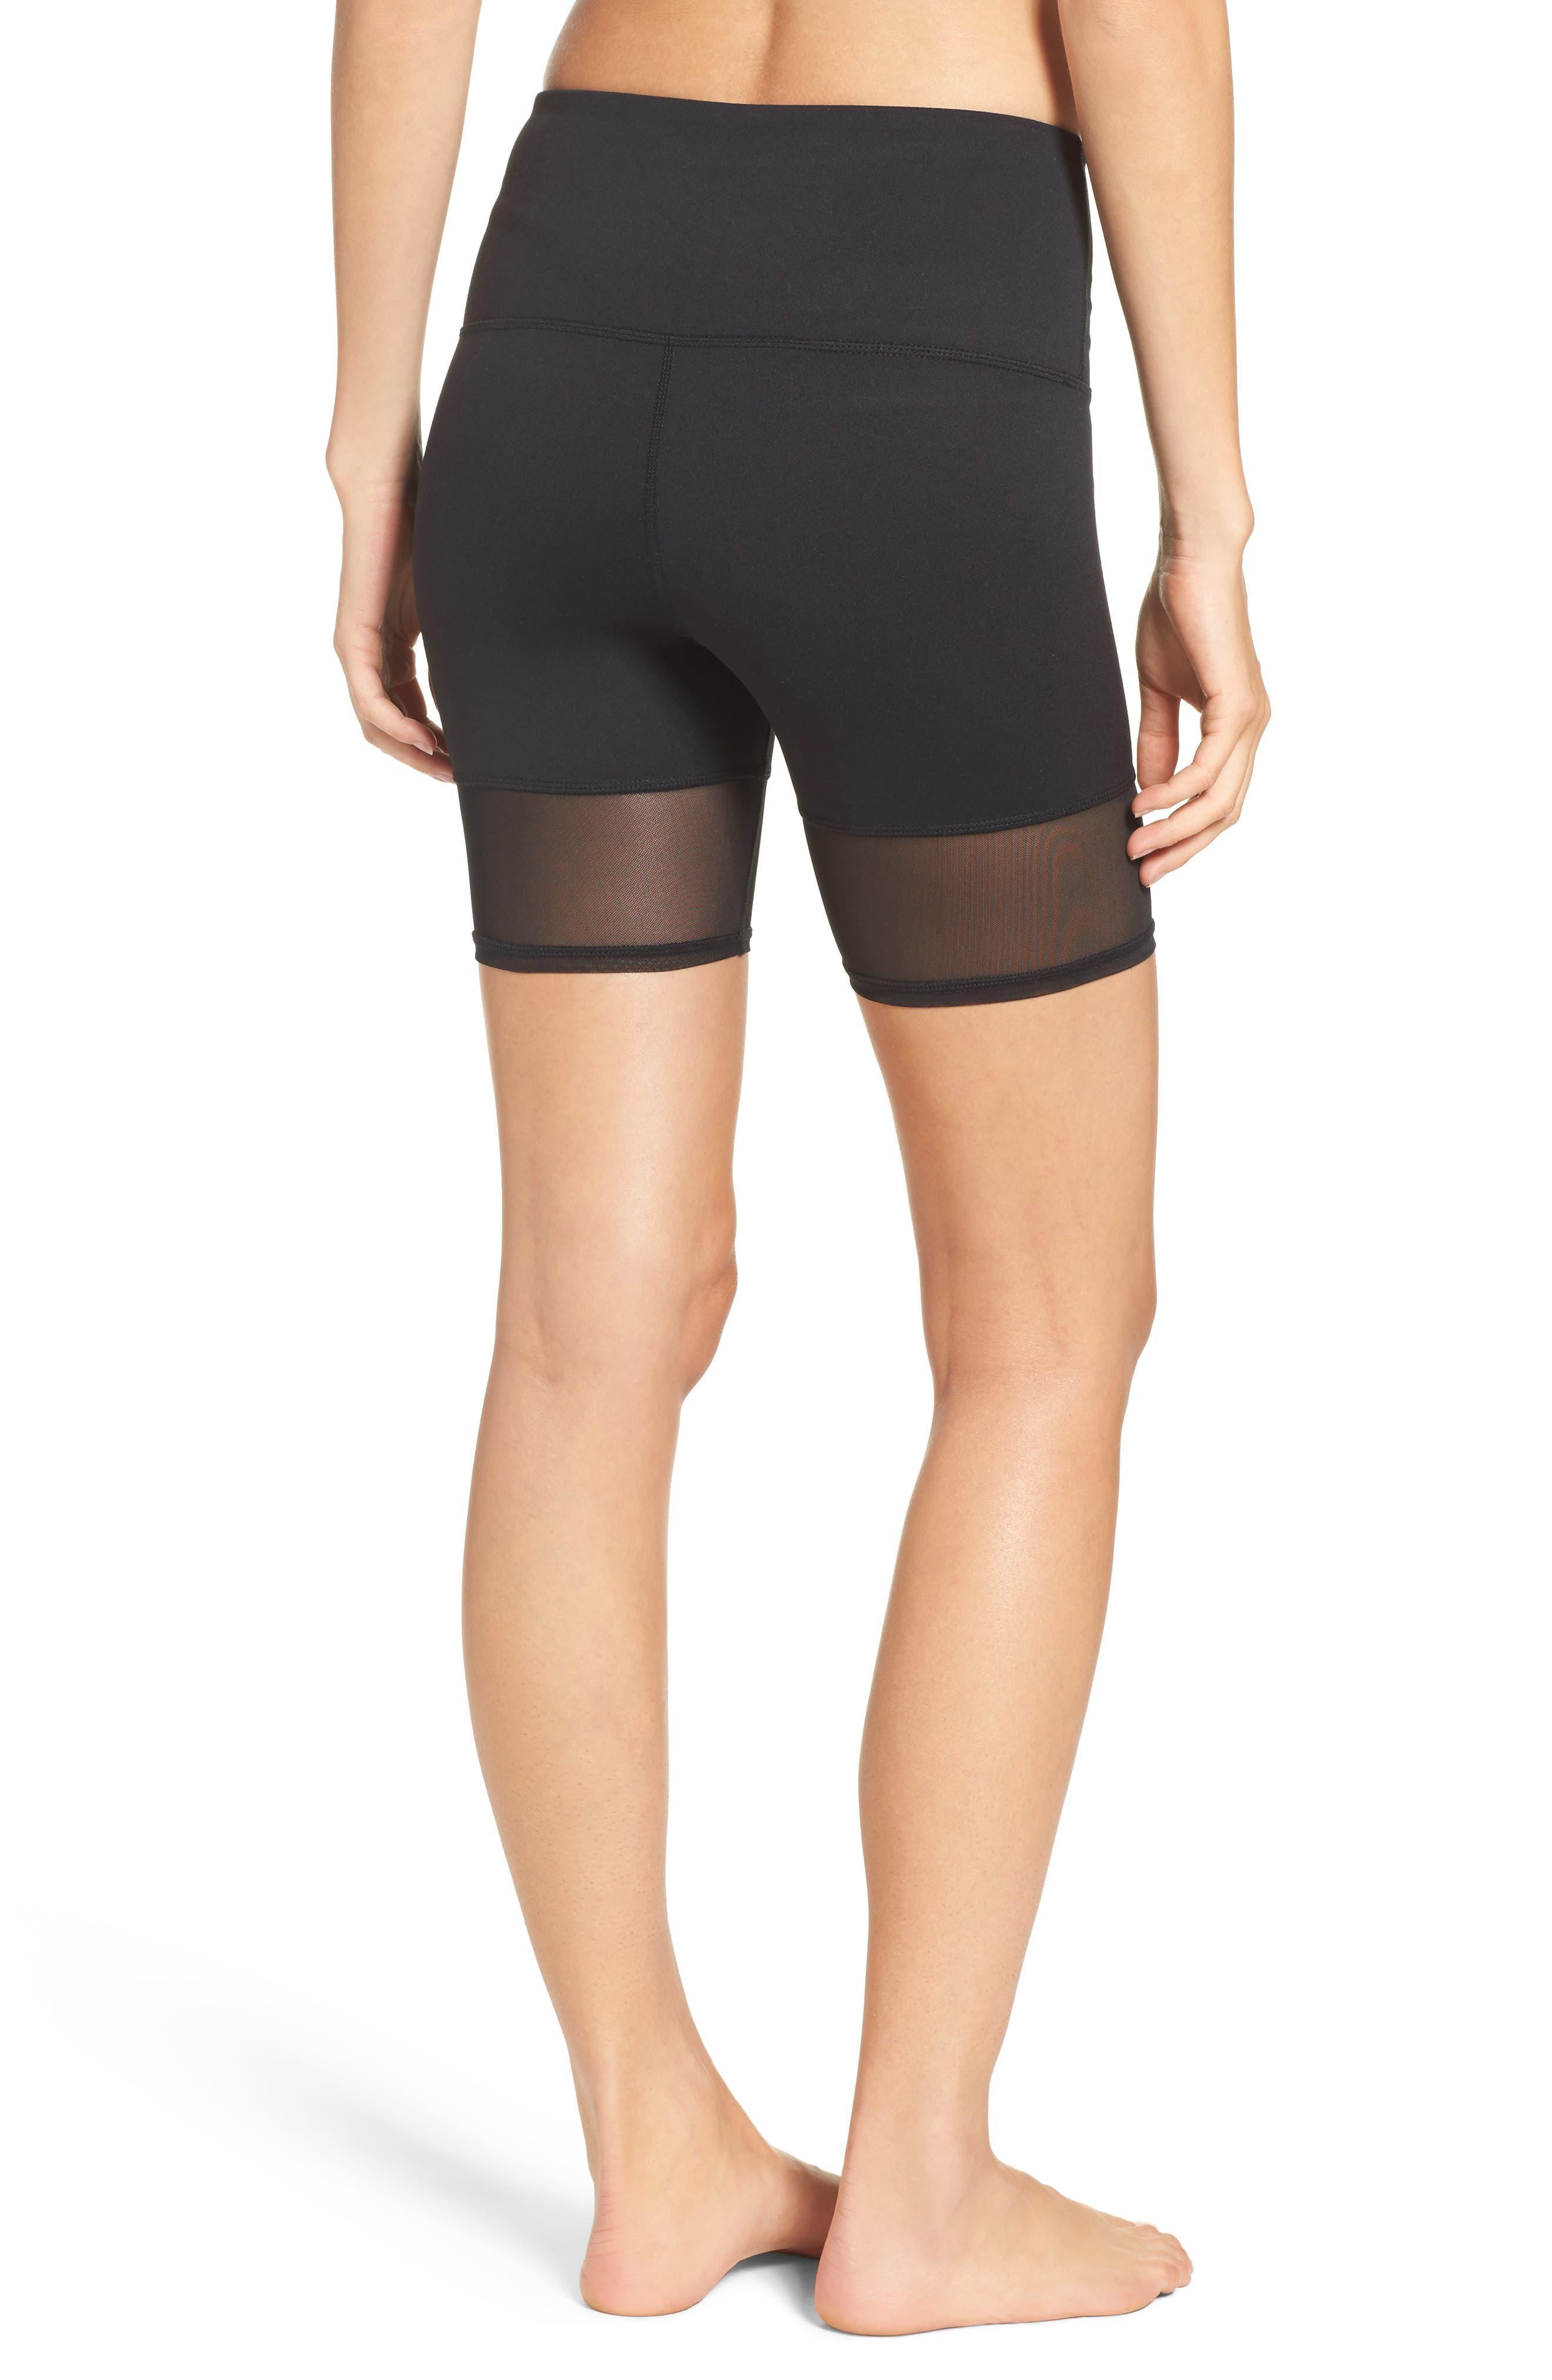 Mia High Waist Mesh Bike Shorts,                             Alternate thumbnail 2, color,                             Black